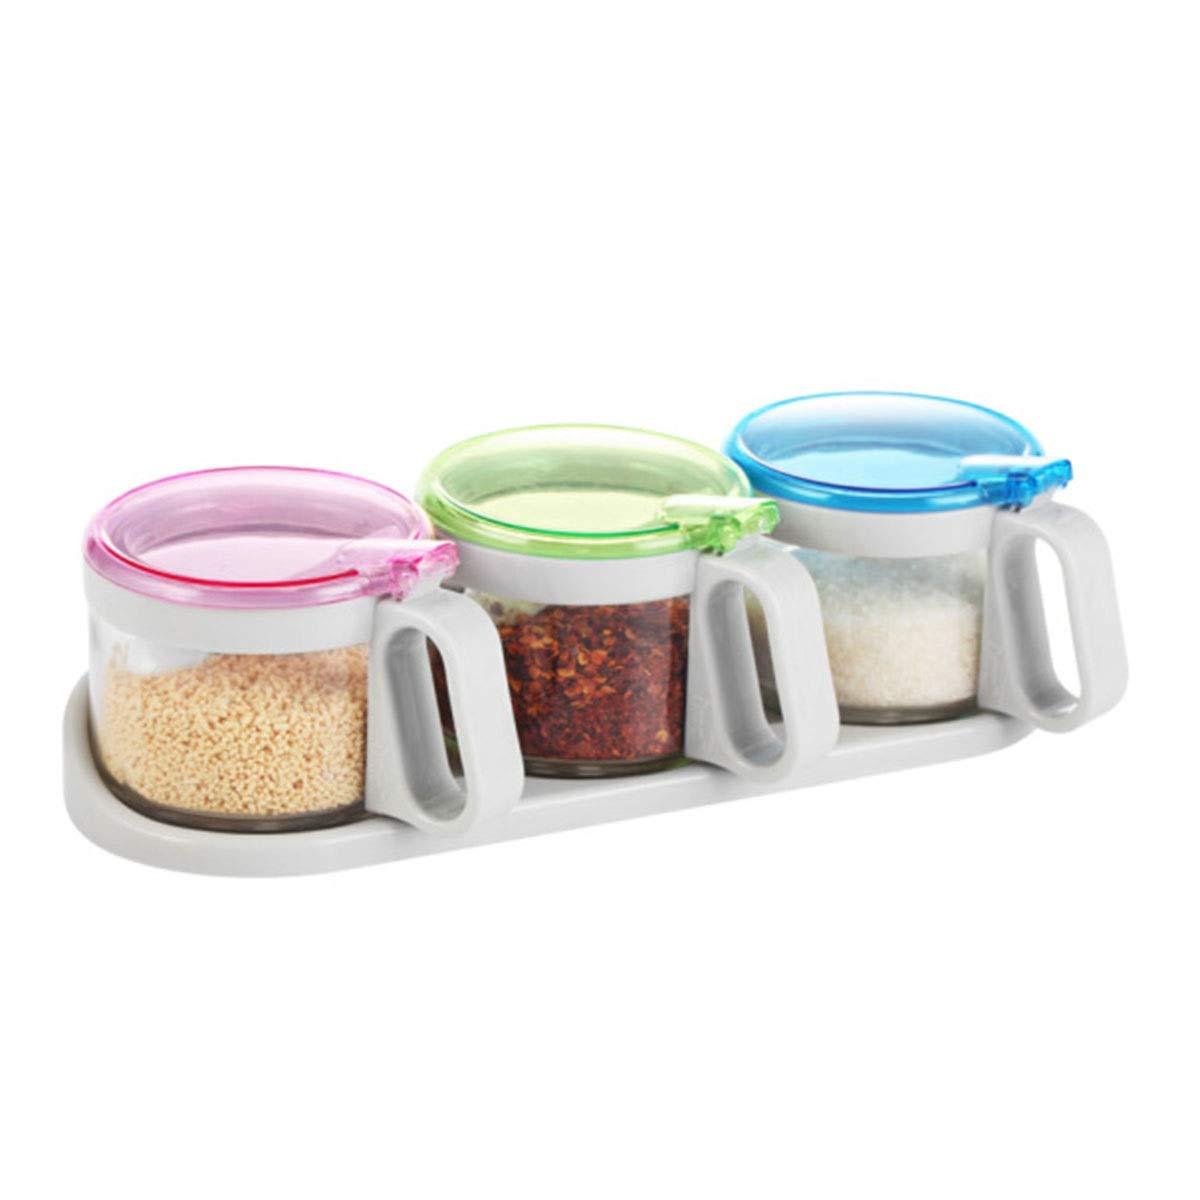 MINGRUIGONGMAO Spice Shaker, 300ML Wonderful Seasoning Tank, Three-piece, Four-piece Glass Jar Plush toys (Size : 300ml3) by MINGRUIGONGMAO